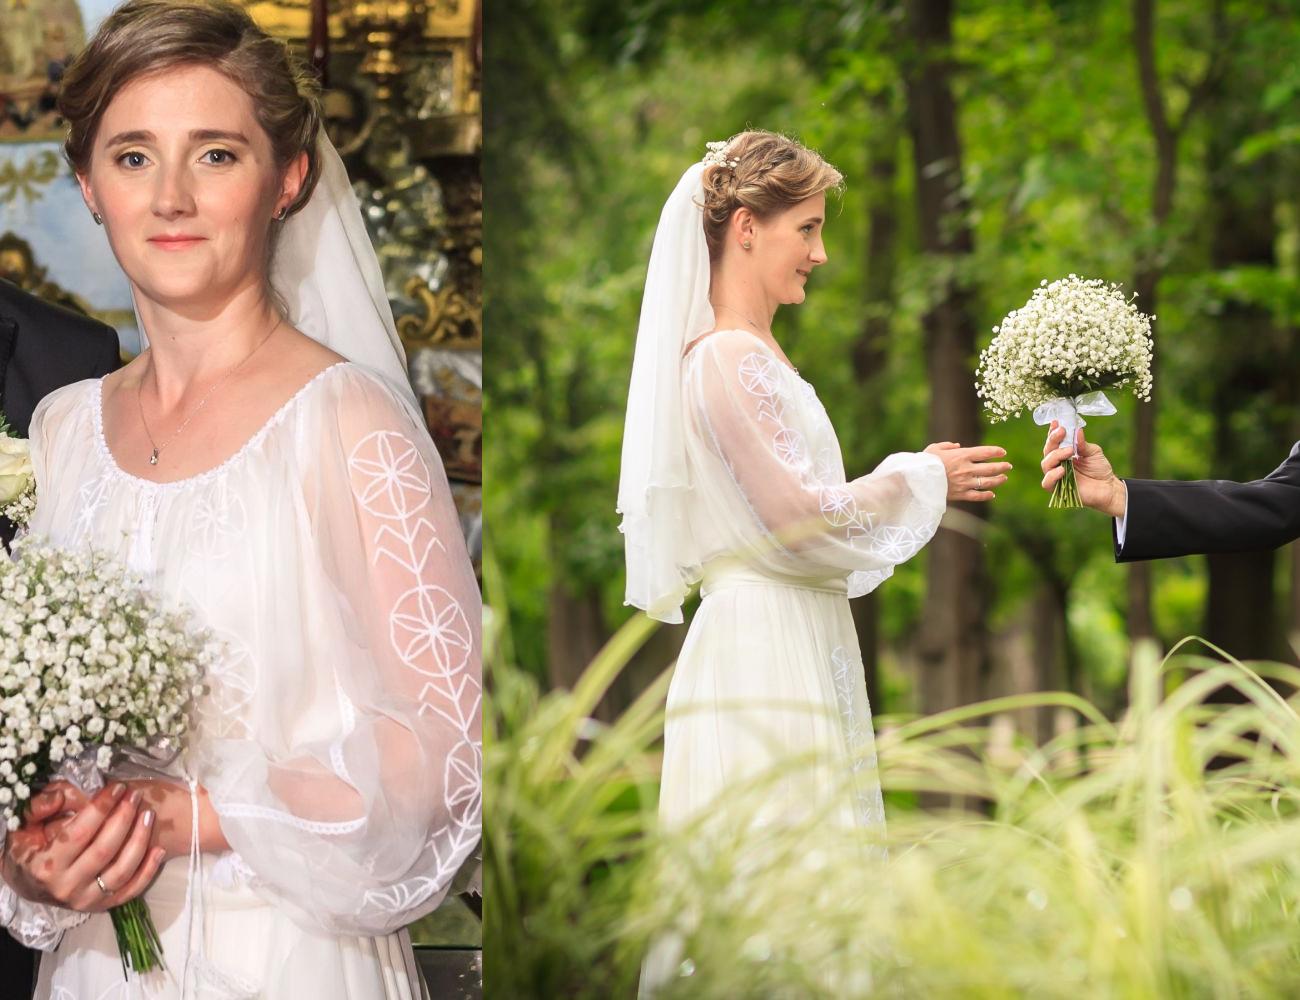 Rochie Mireasa Traditionala Pentru Nunta Traditionala Romaneasca 03